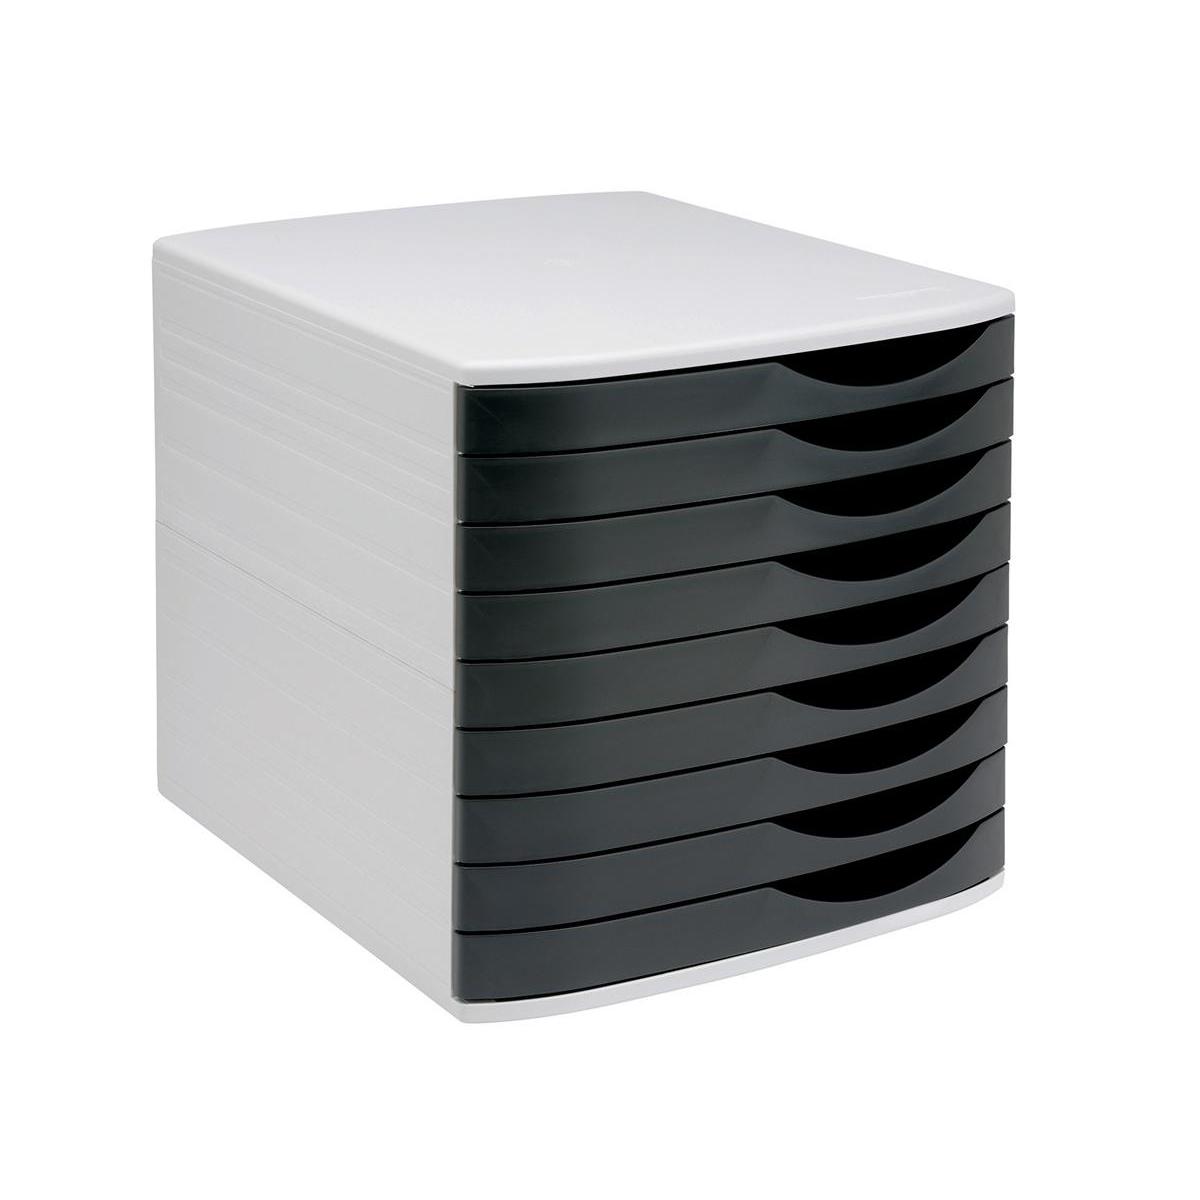 5 Star Elite Desktop Drawer Set 9 Drawers A4 And Foolscap Grey Black